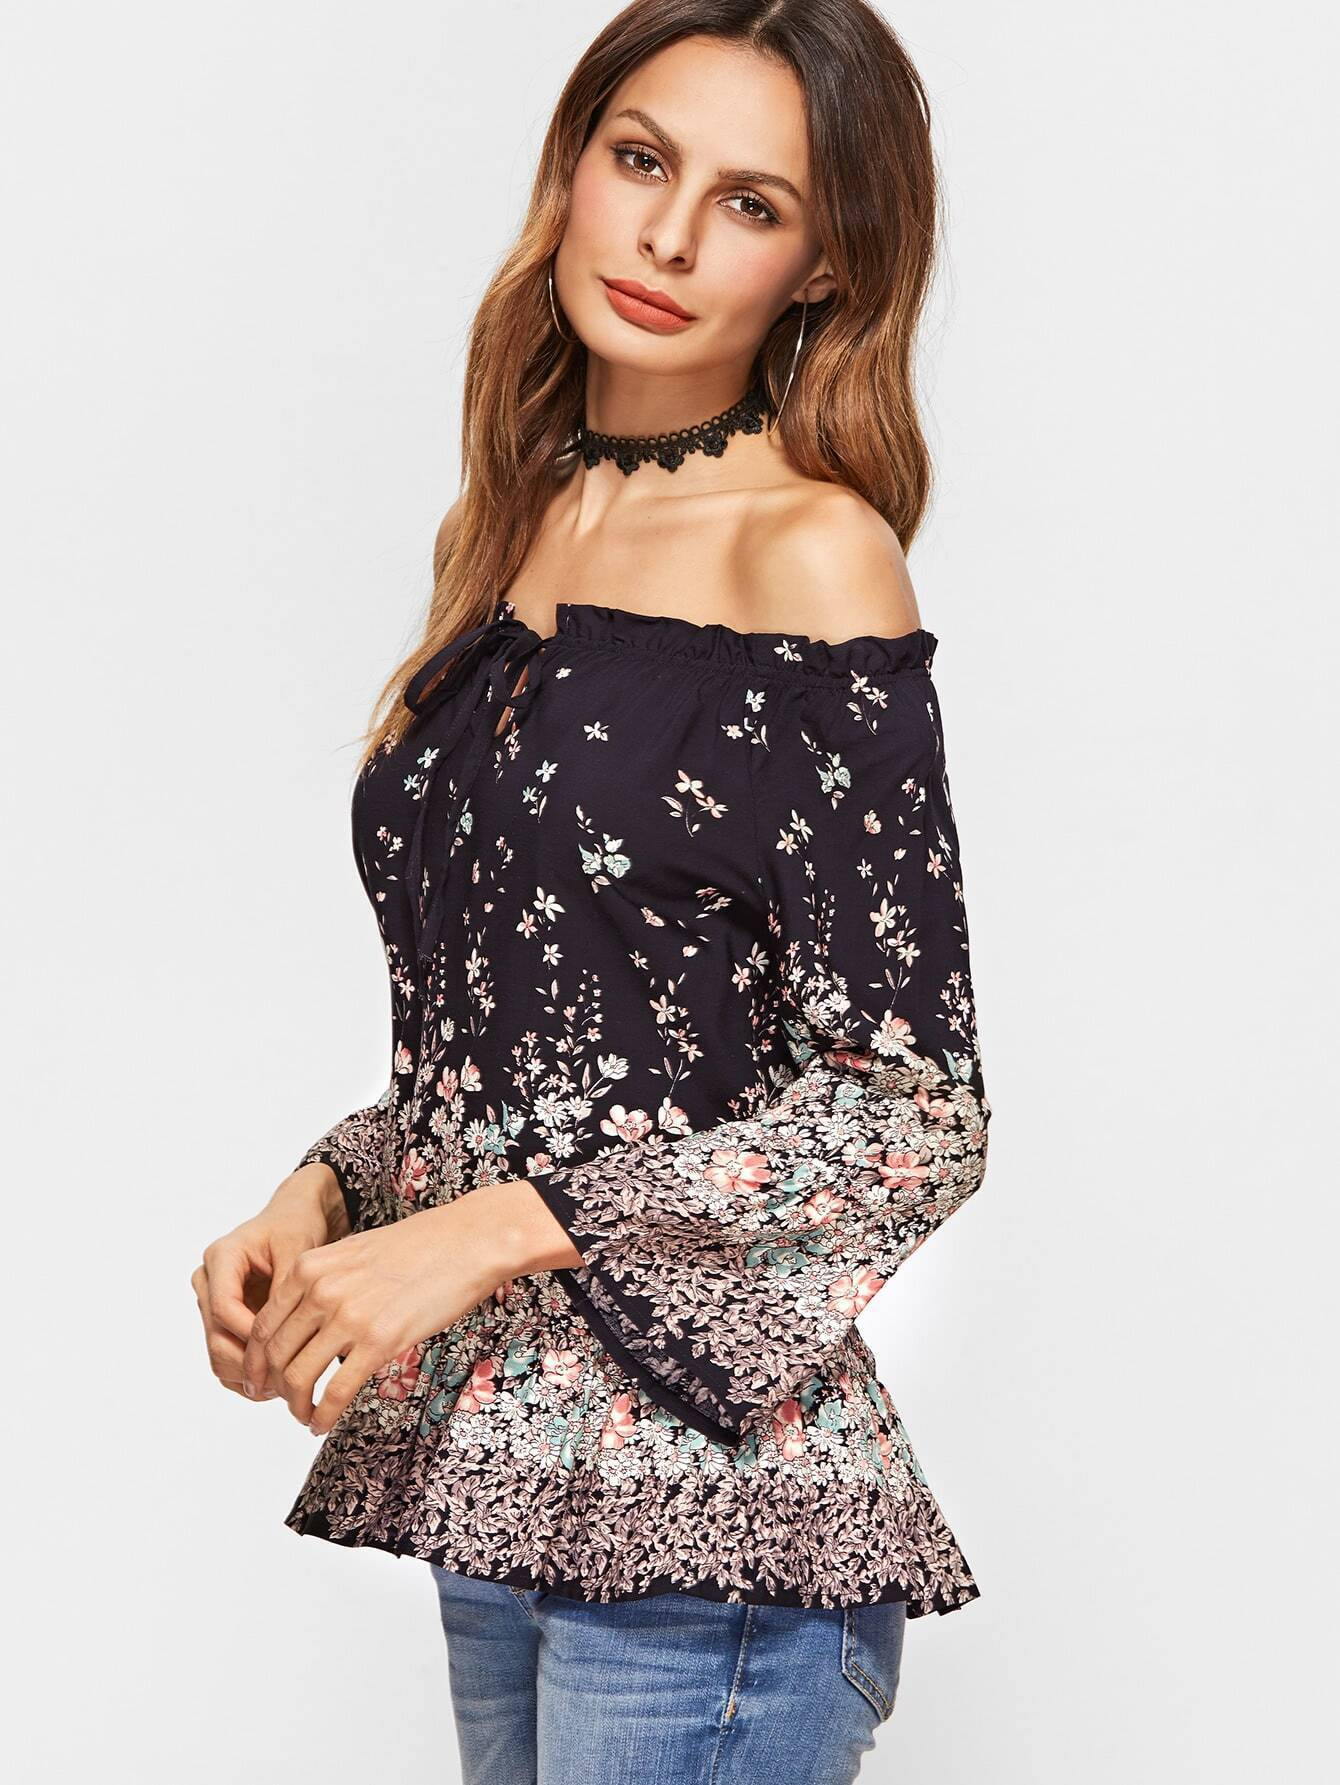 blouse161206472_2